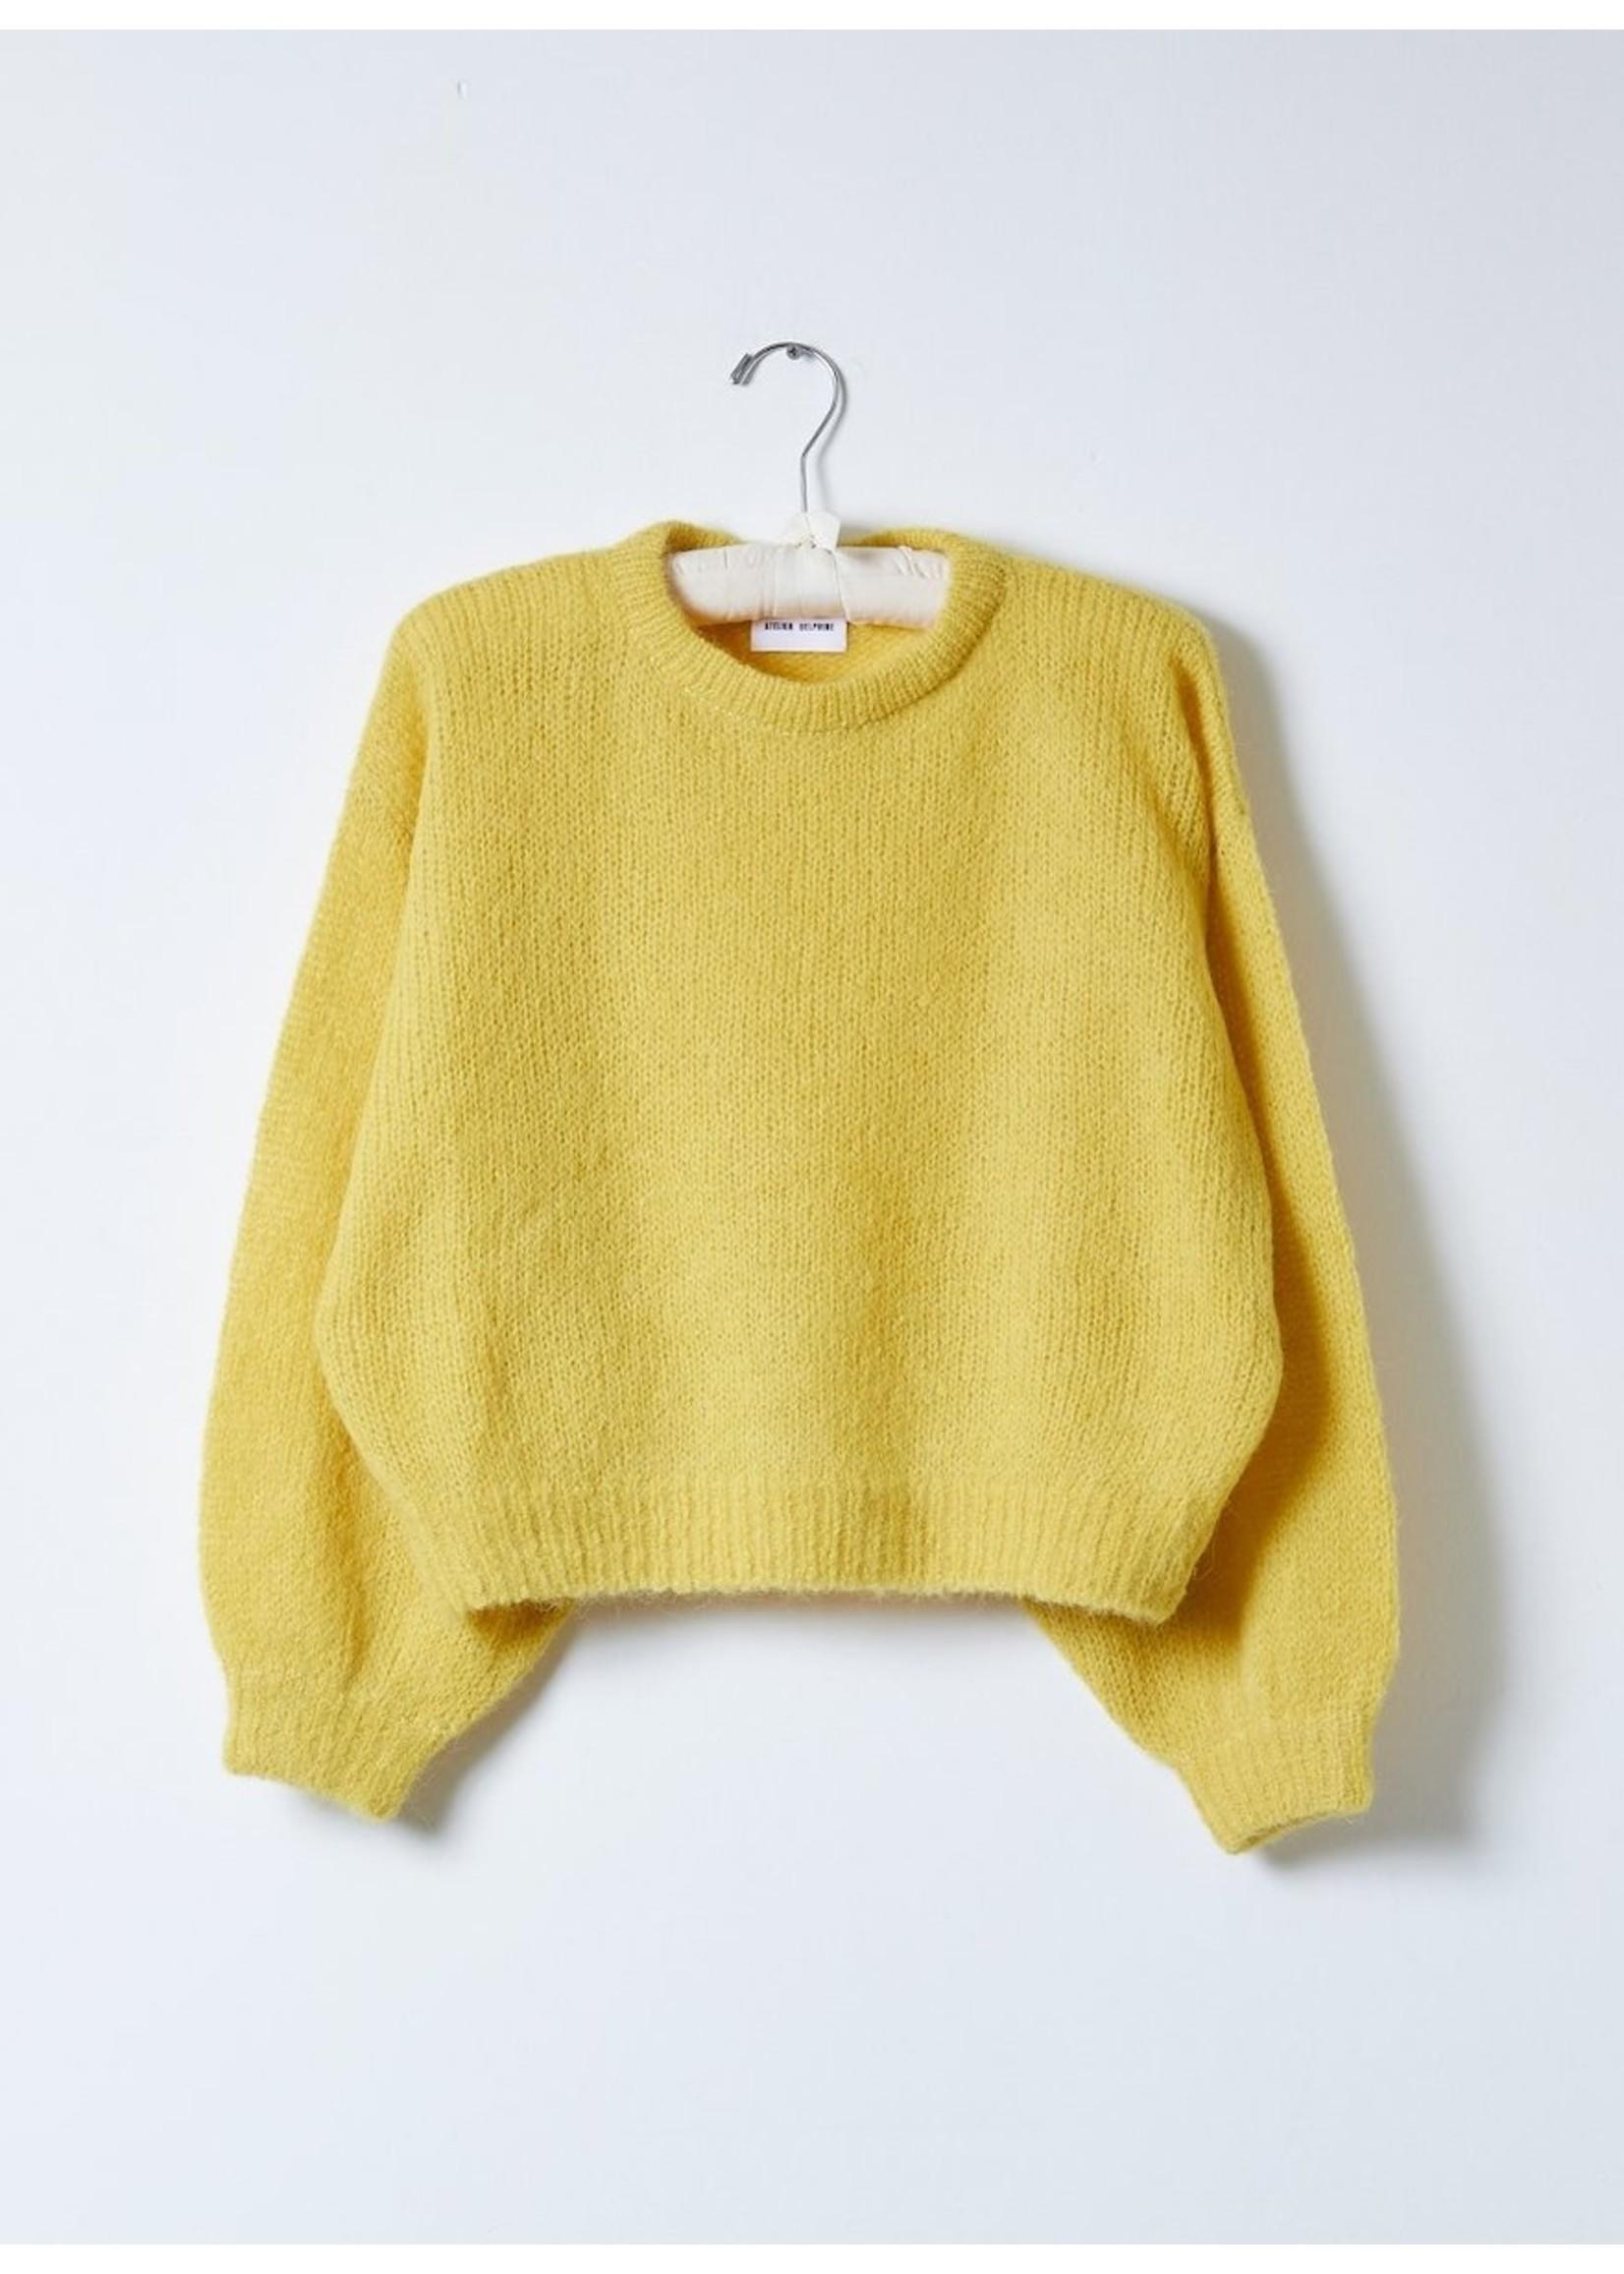 Atelier Delphine Atelier Delphine Dijon Balloon Sleeve Sweater